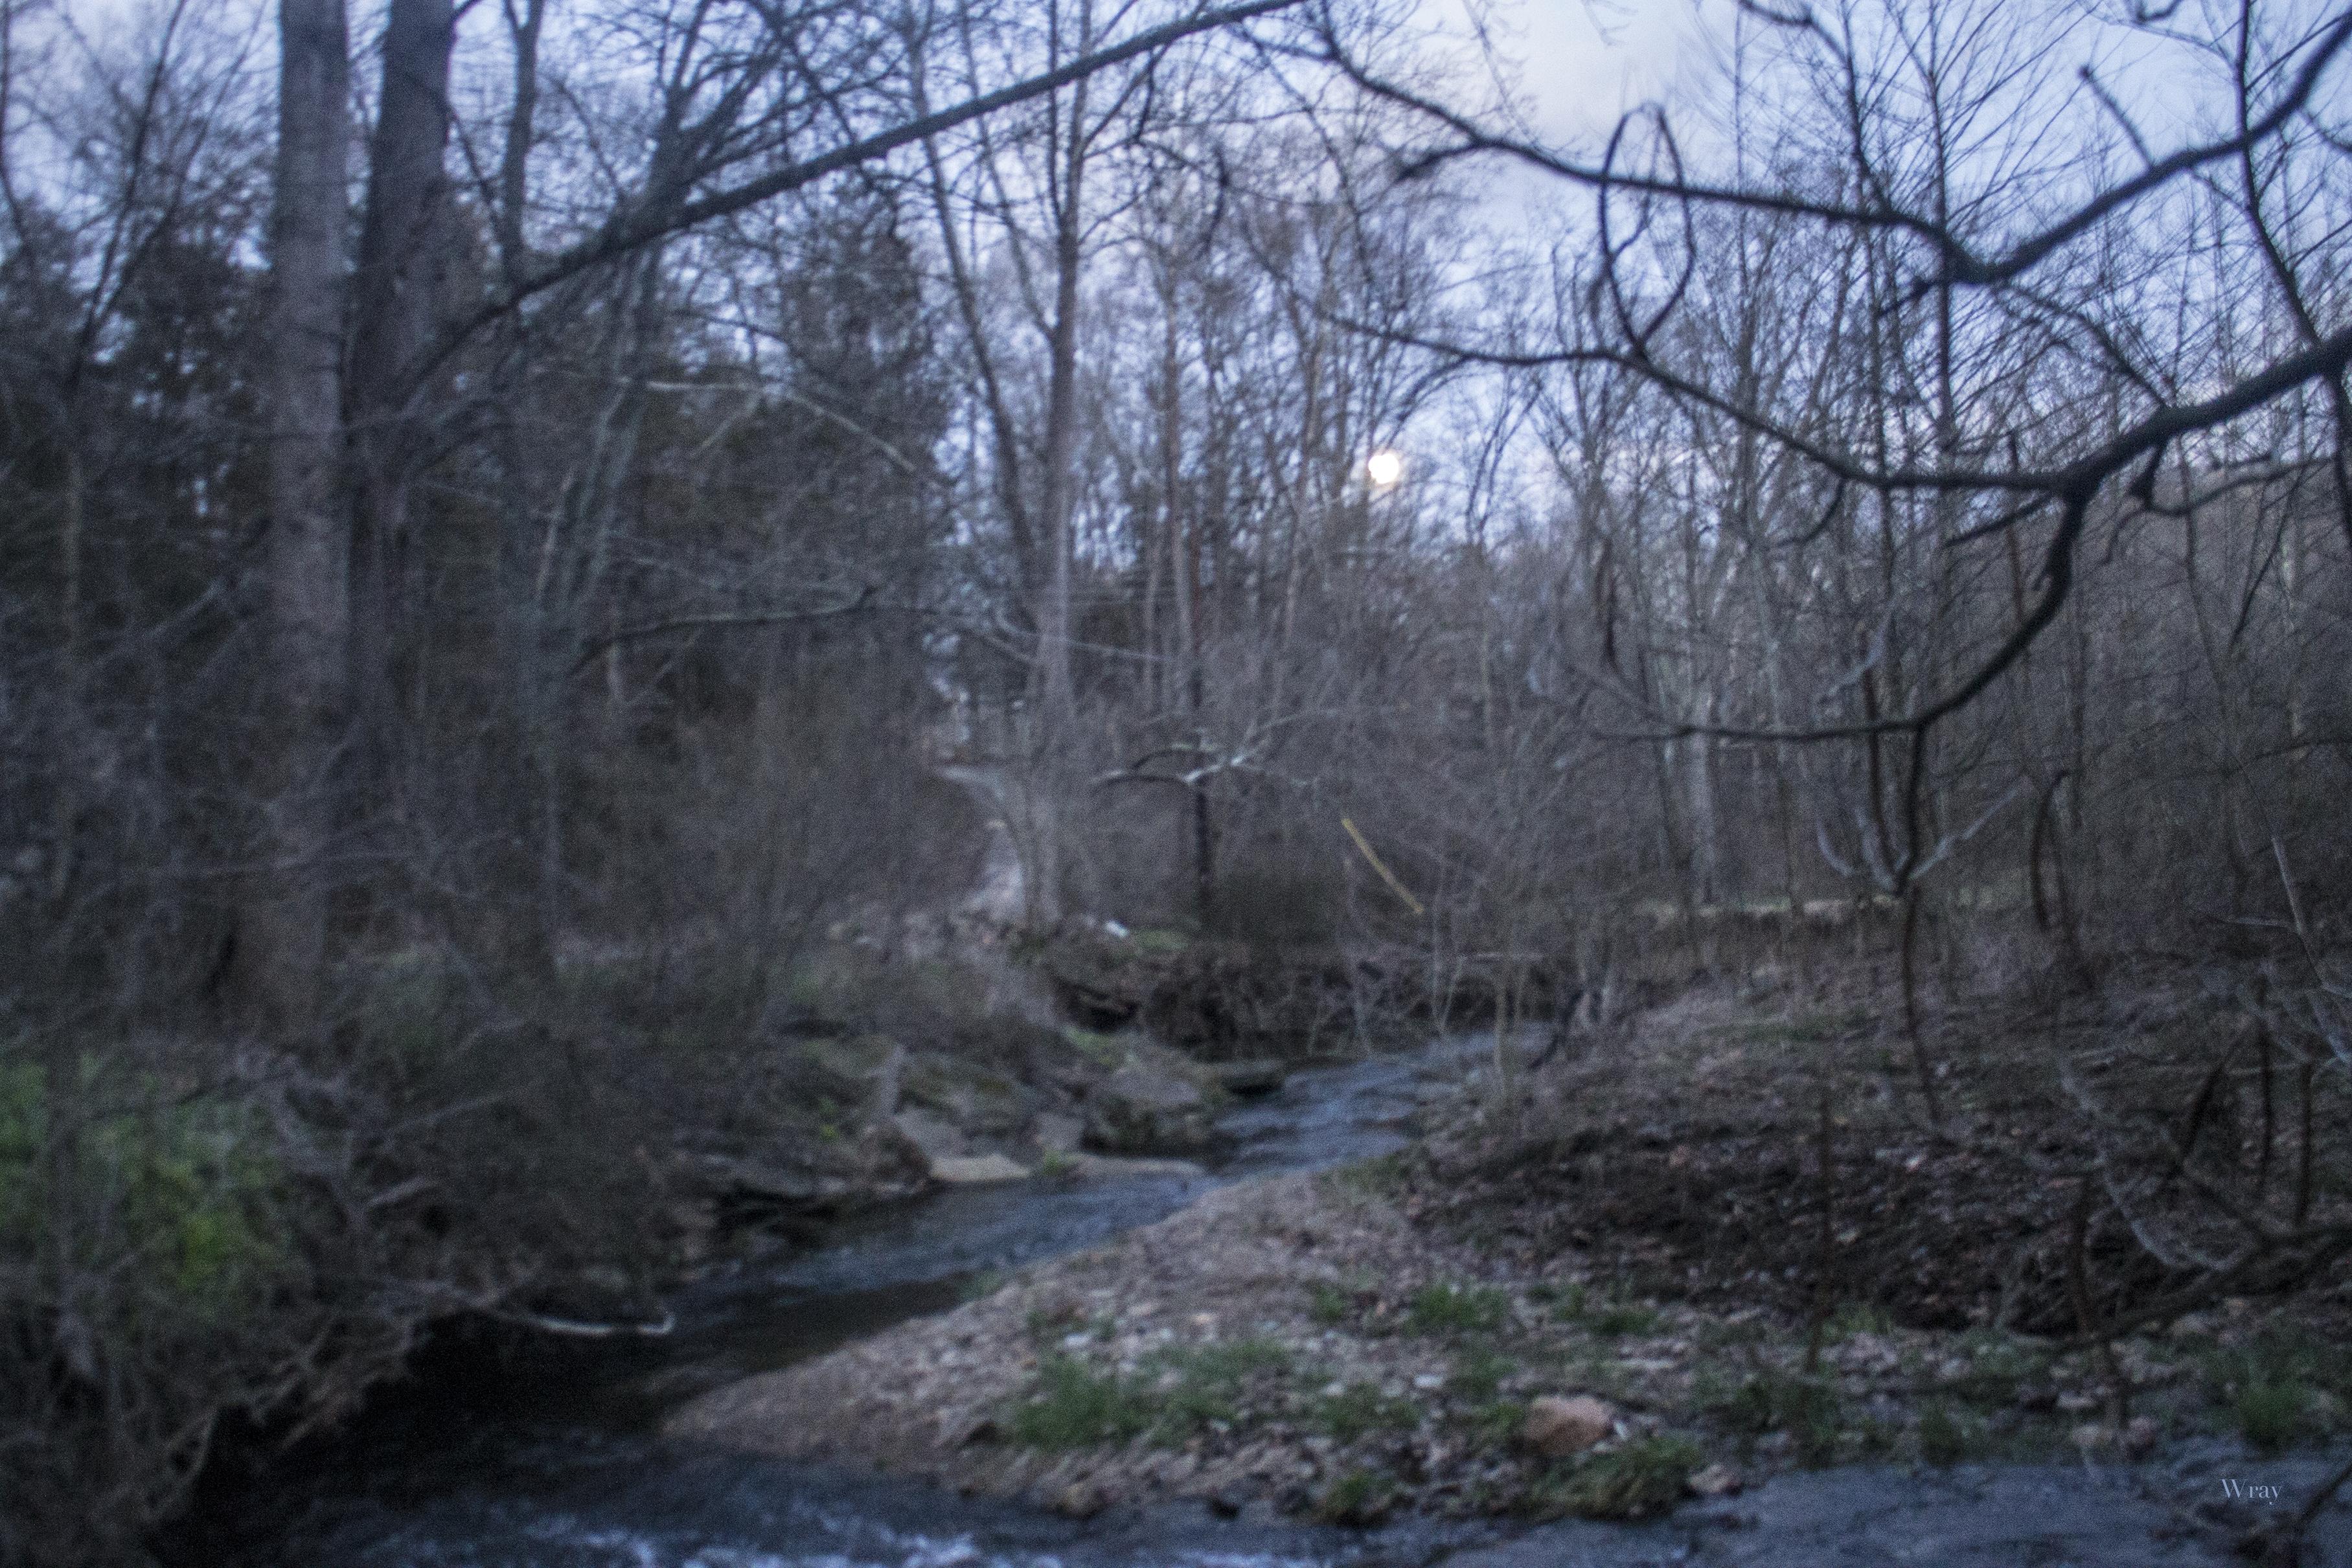 Wild Creekside